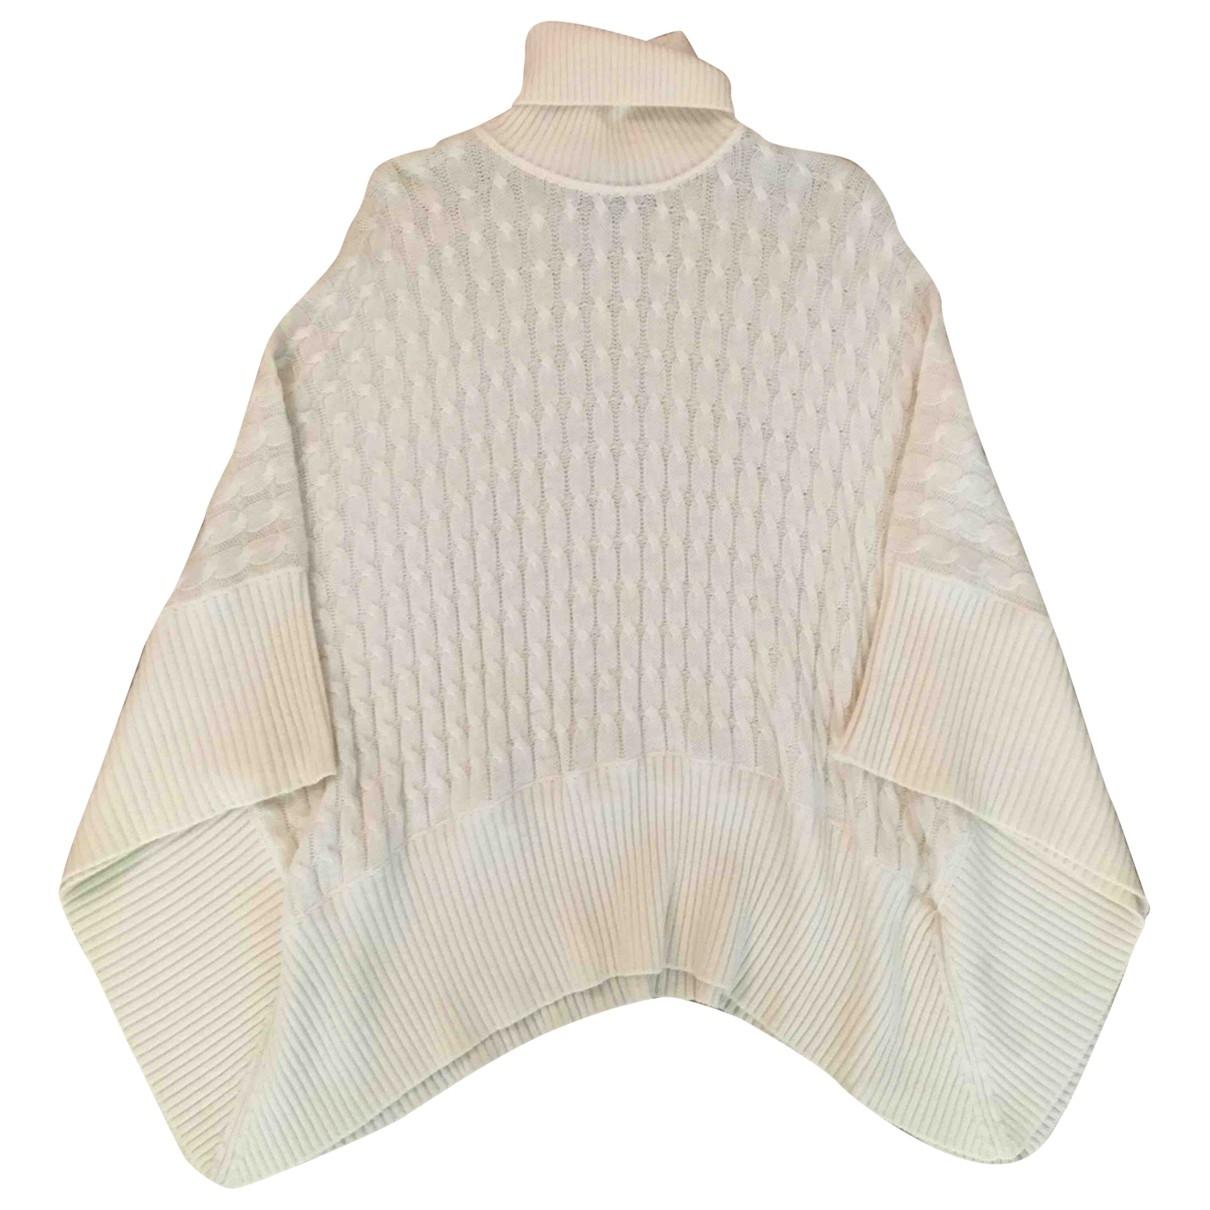 Max Mara Studio - Pull   pour femme en laine - blanc